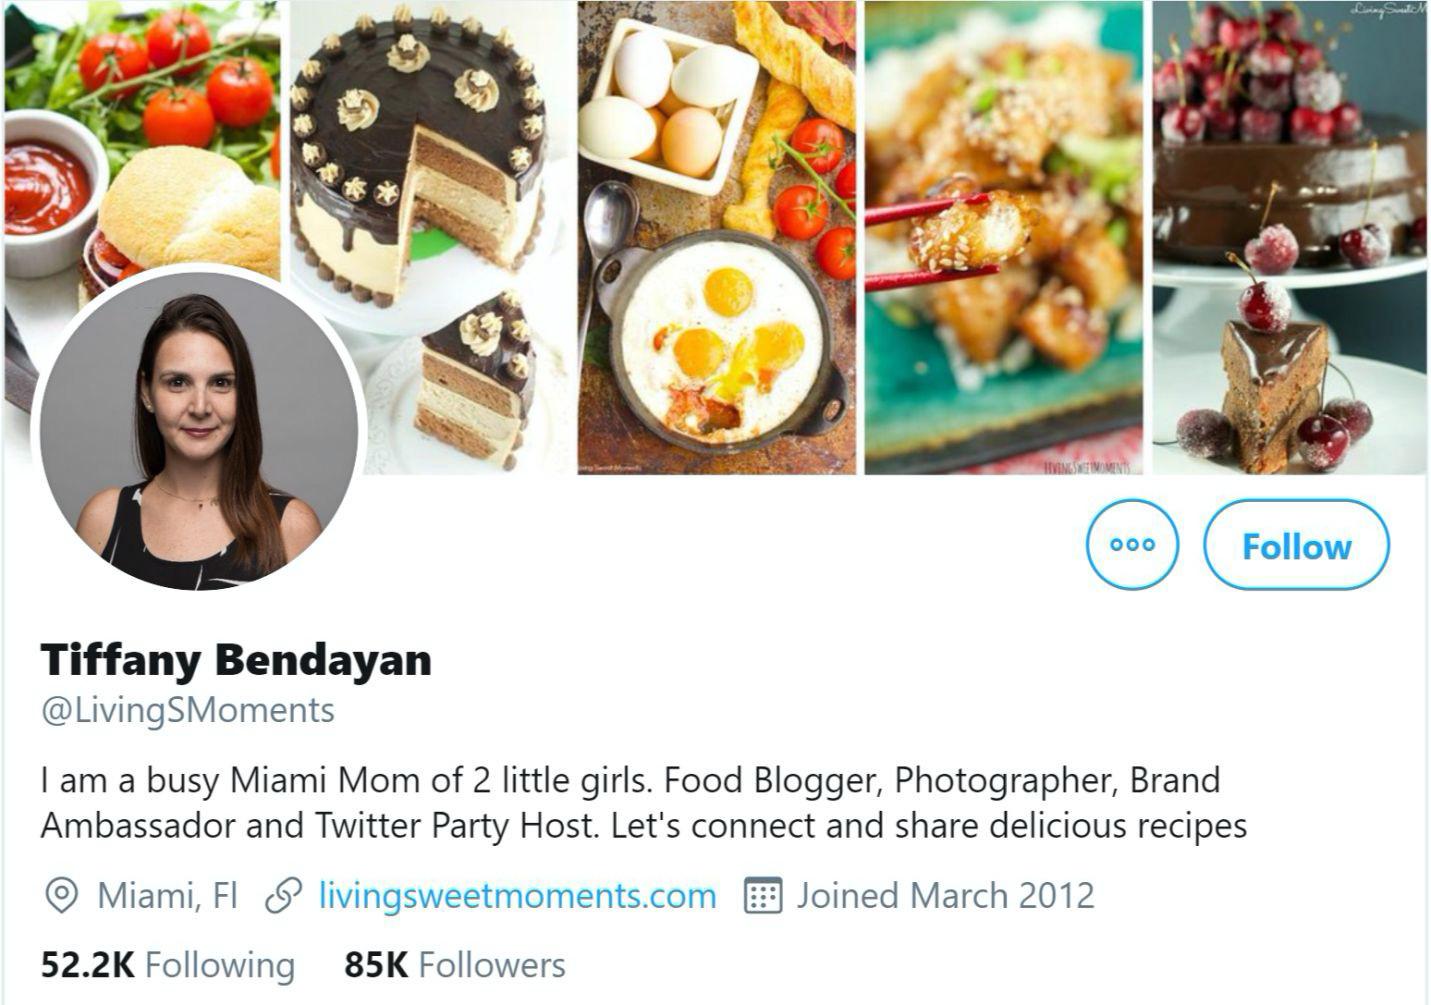 tiffany bendayan twitter influencer